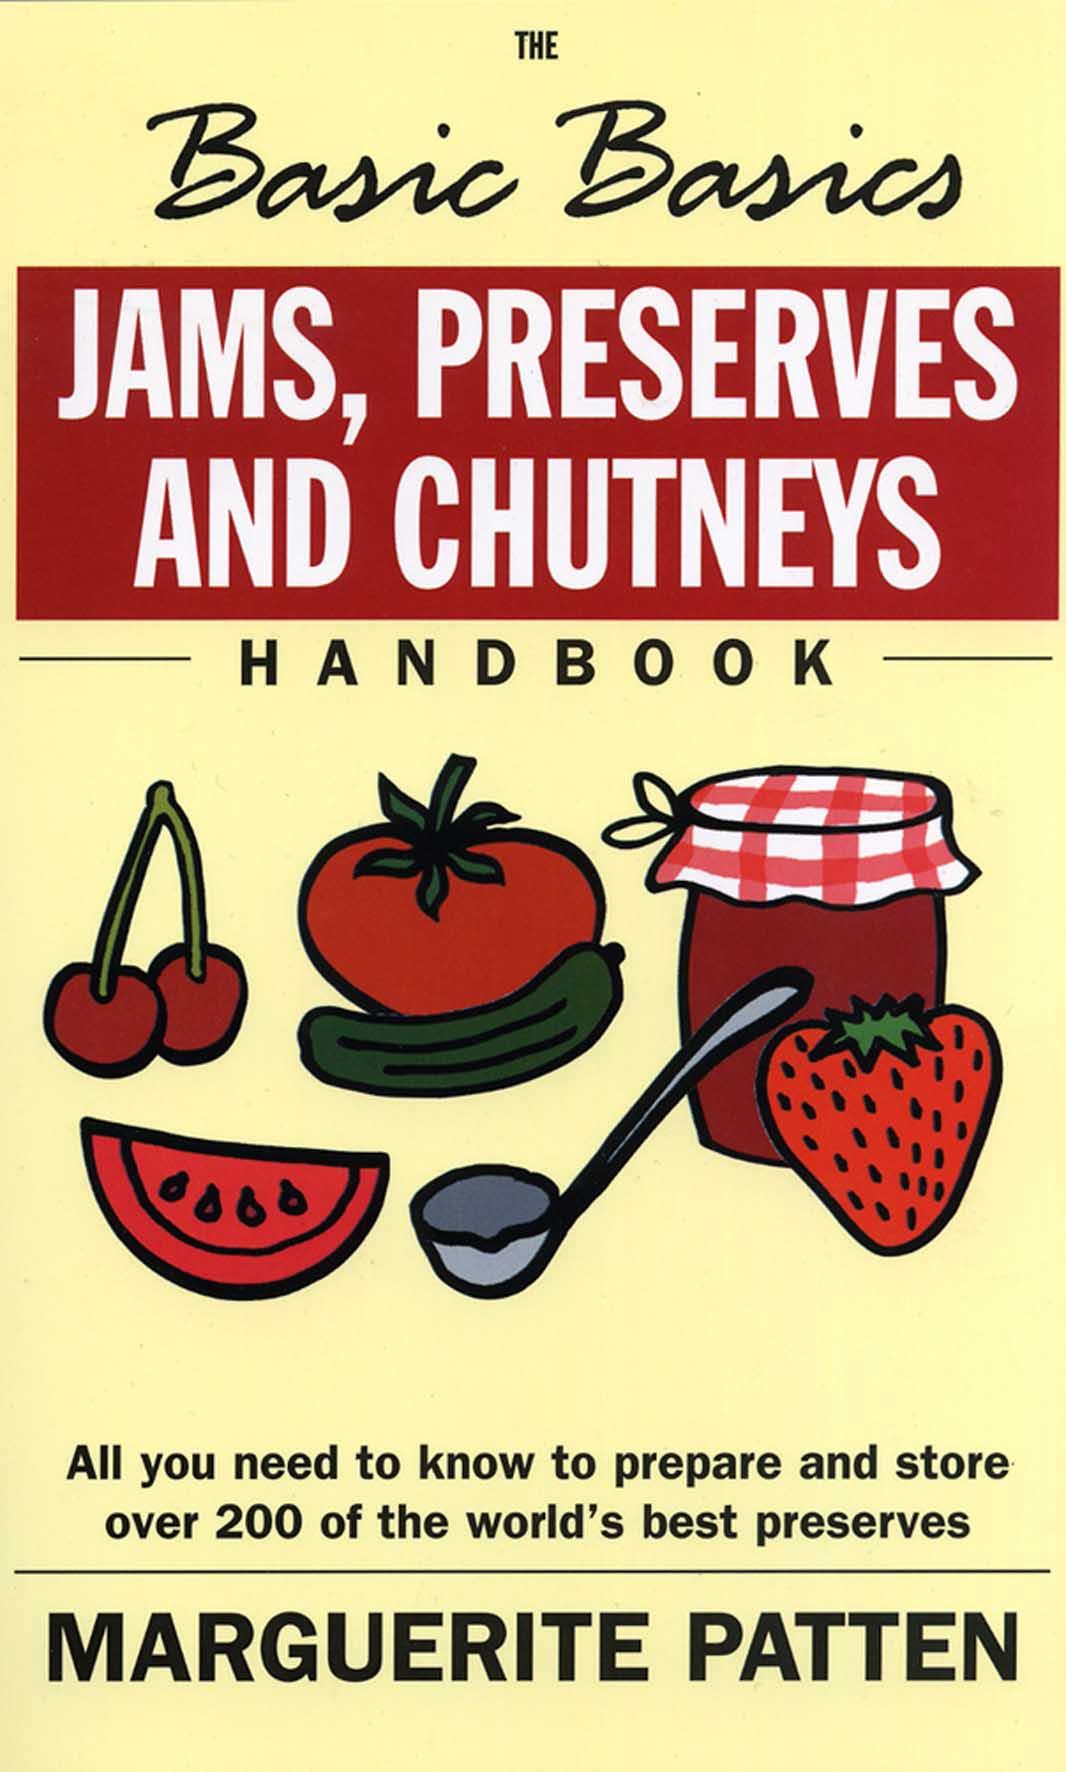 The Basic Basics Jams, Preserves and Chutneys Handbook